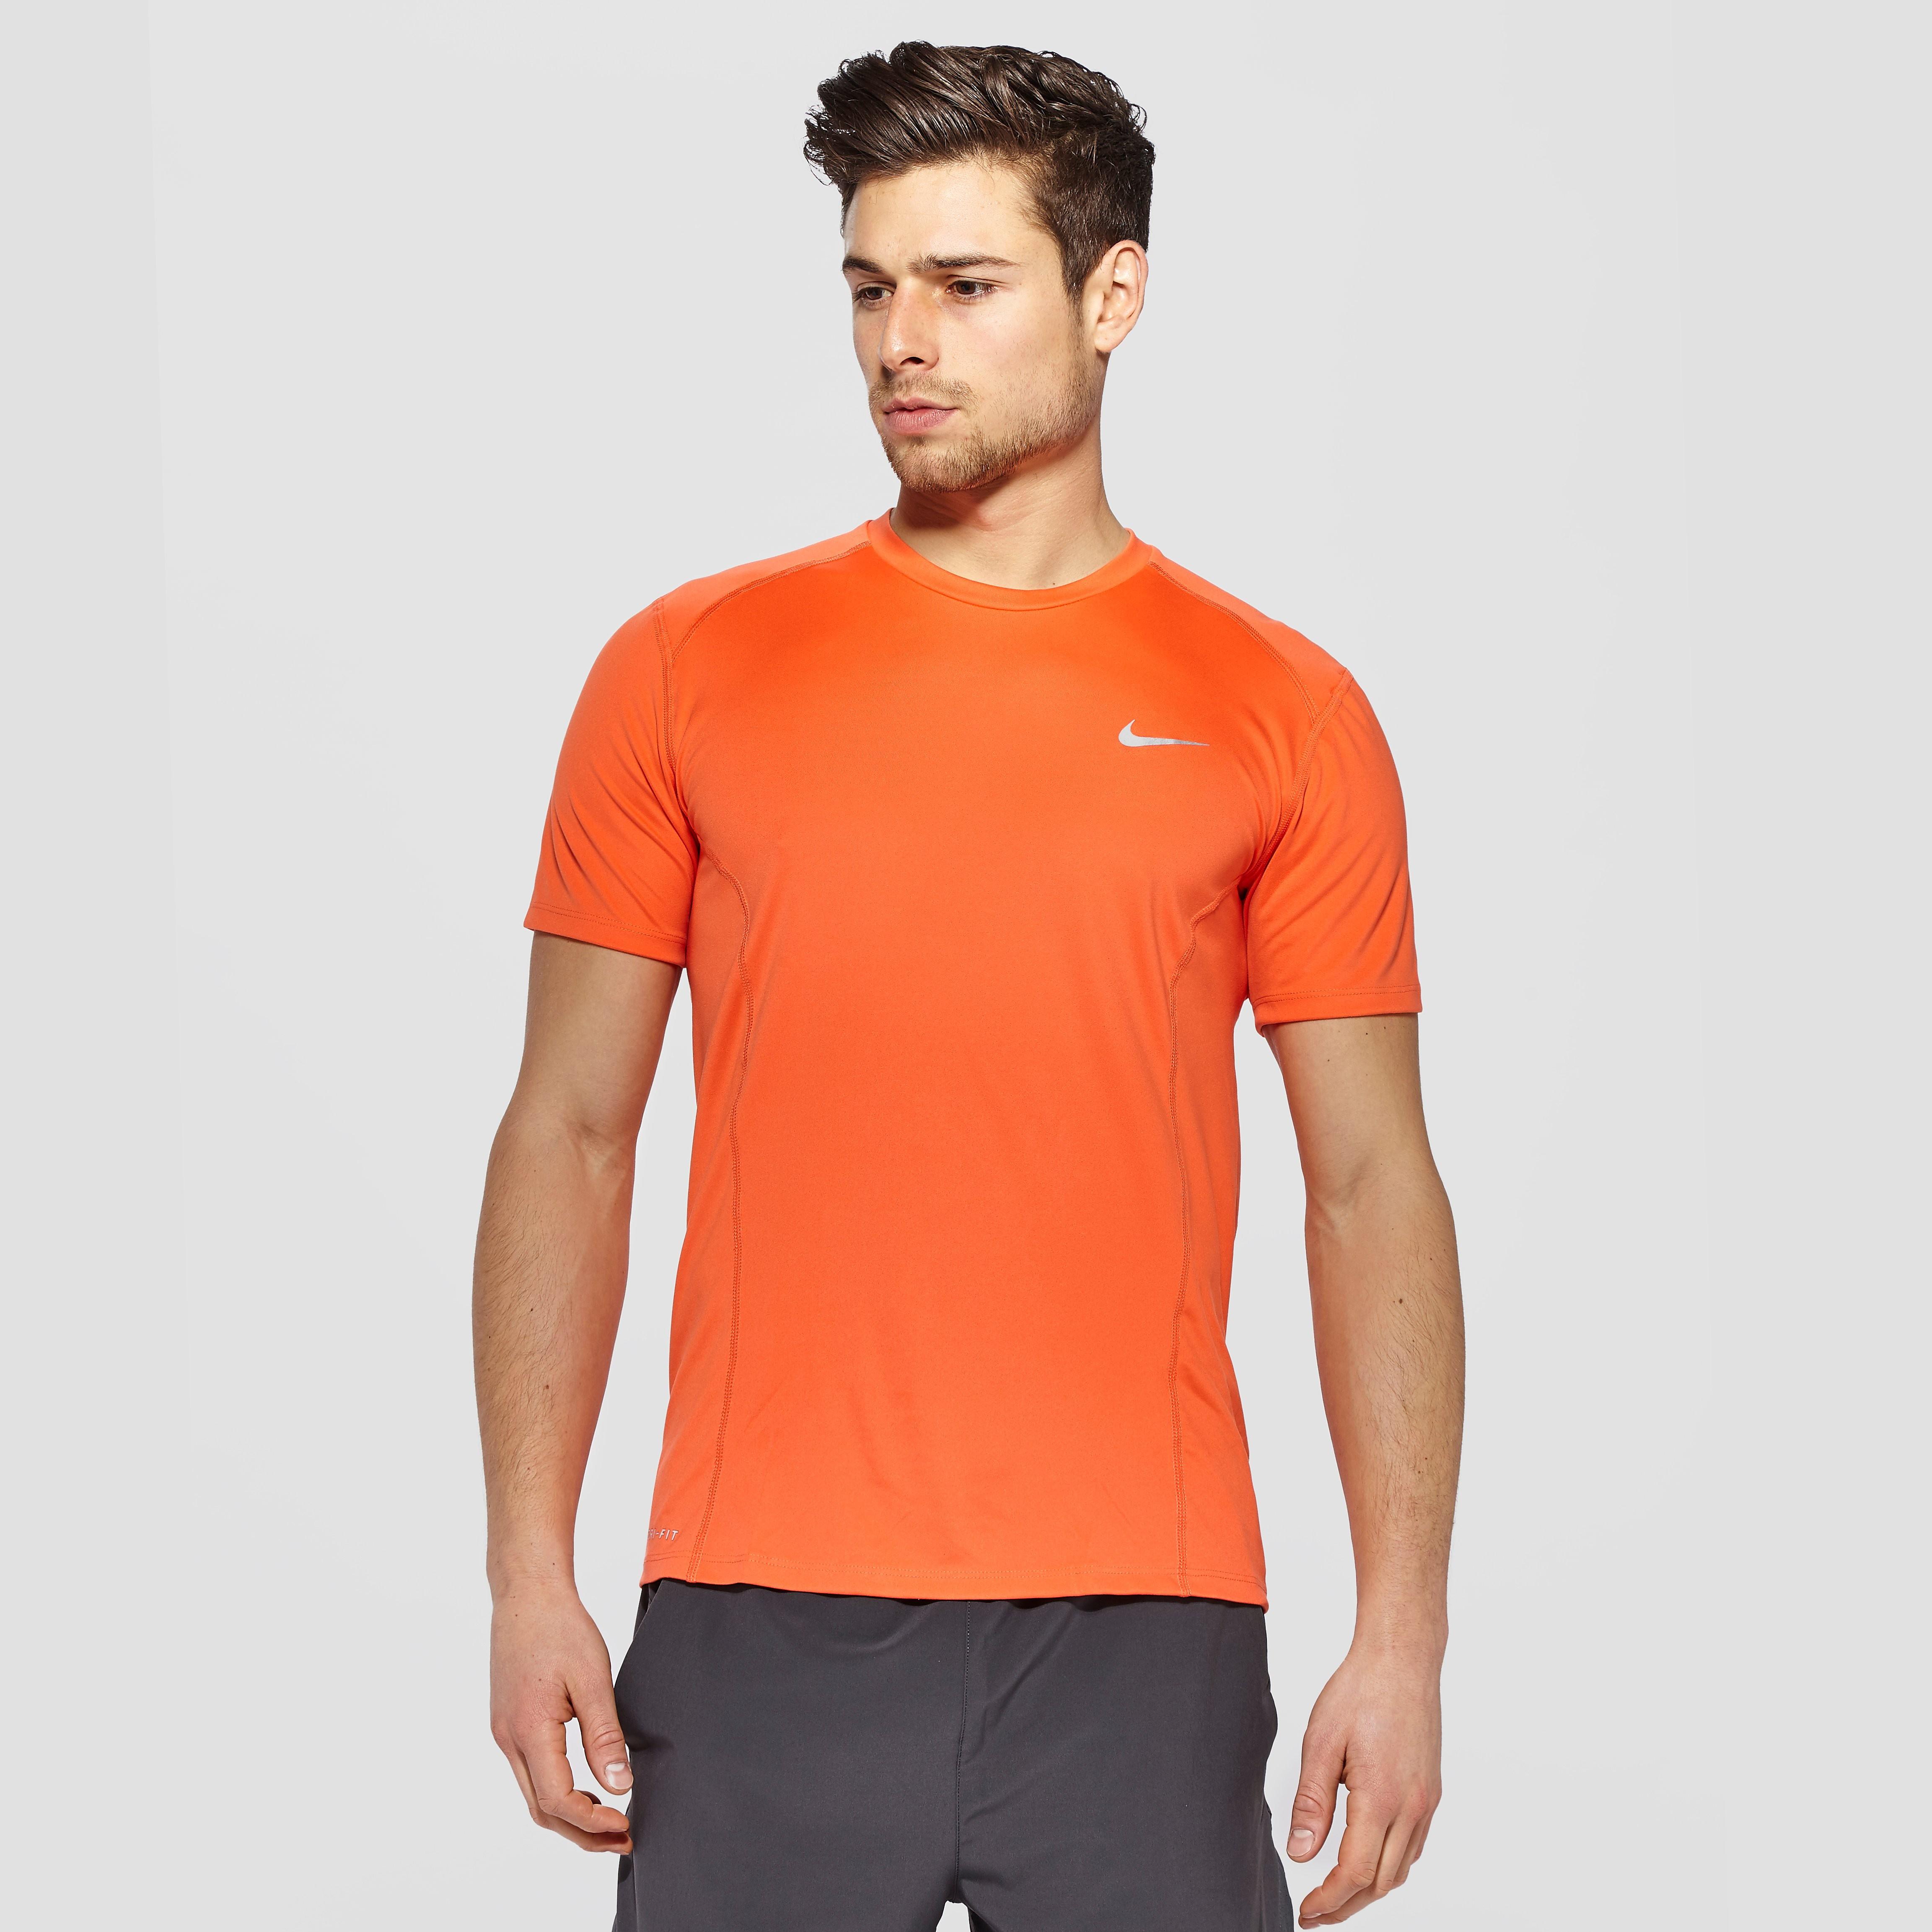 Nike Dry Miler Short-Sleeve Men's Top